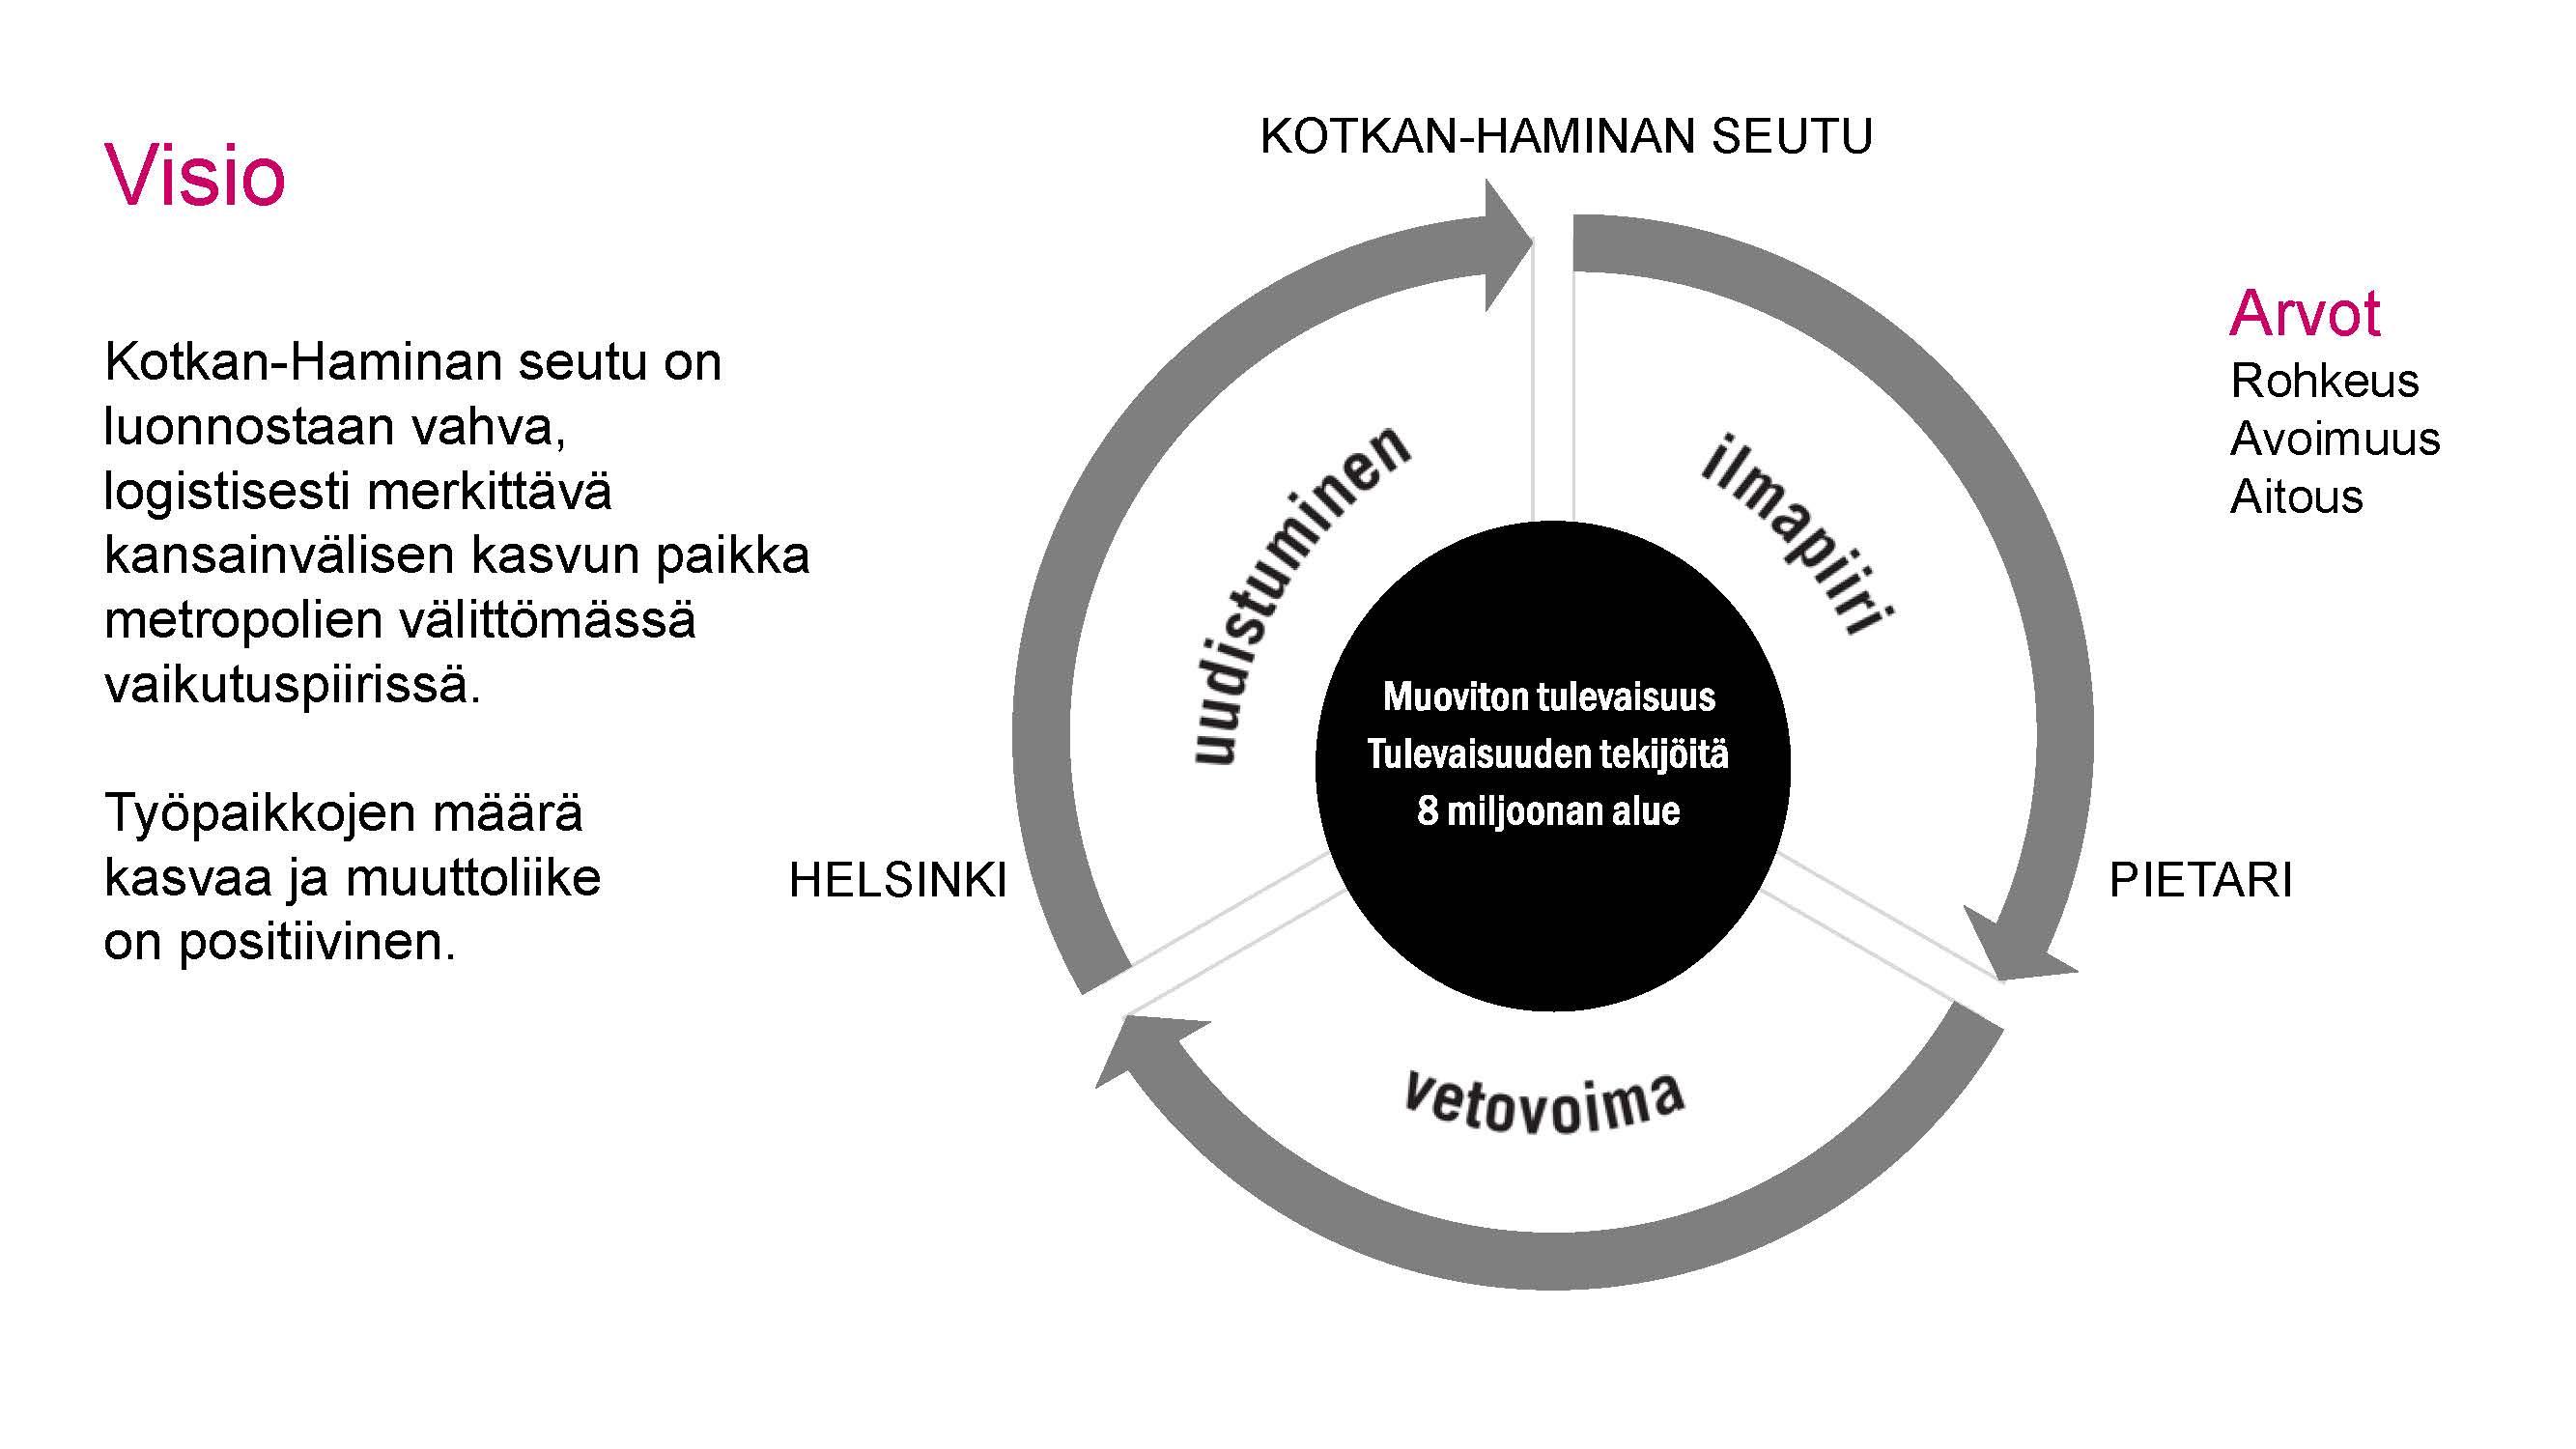 Strategia visio, arvot ja kärjet